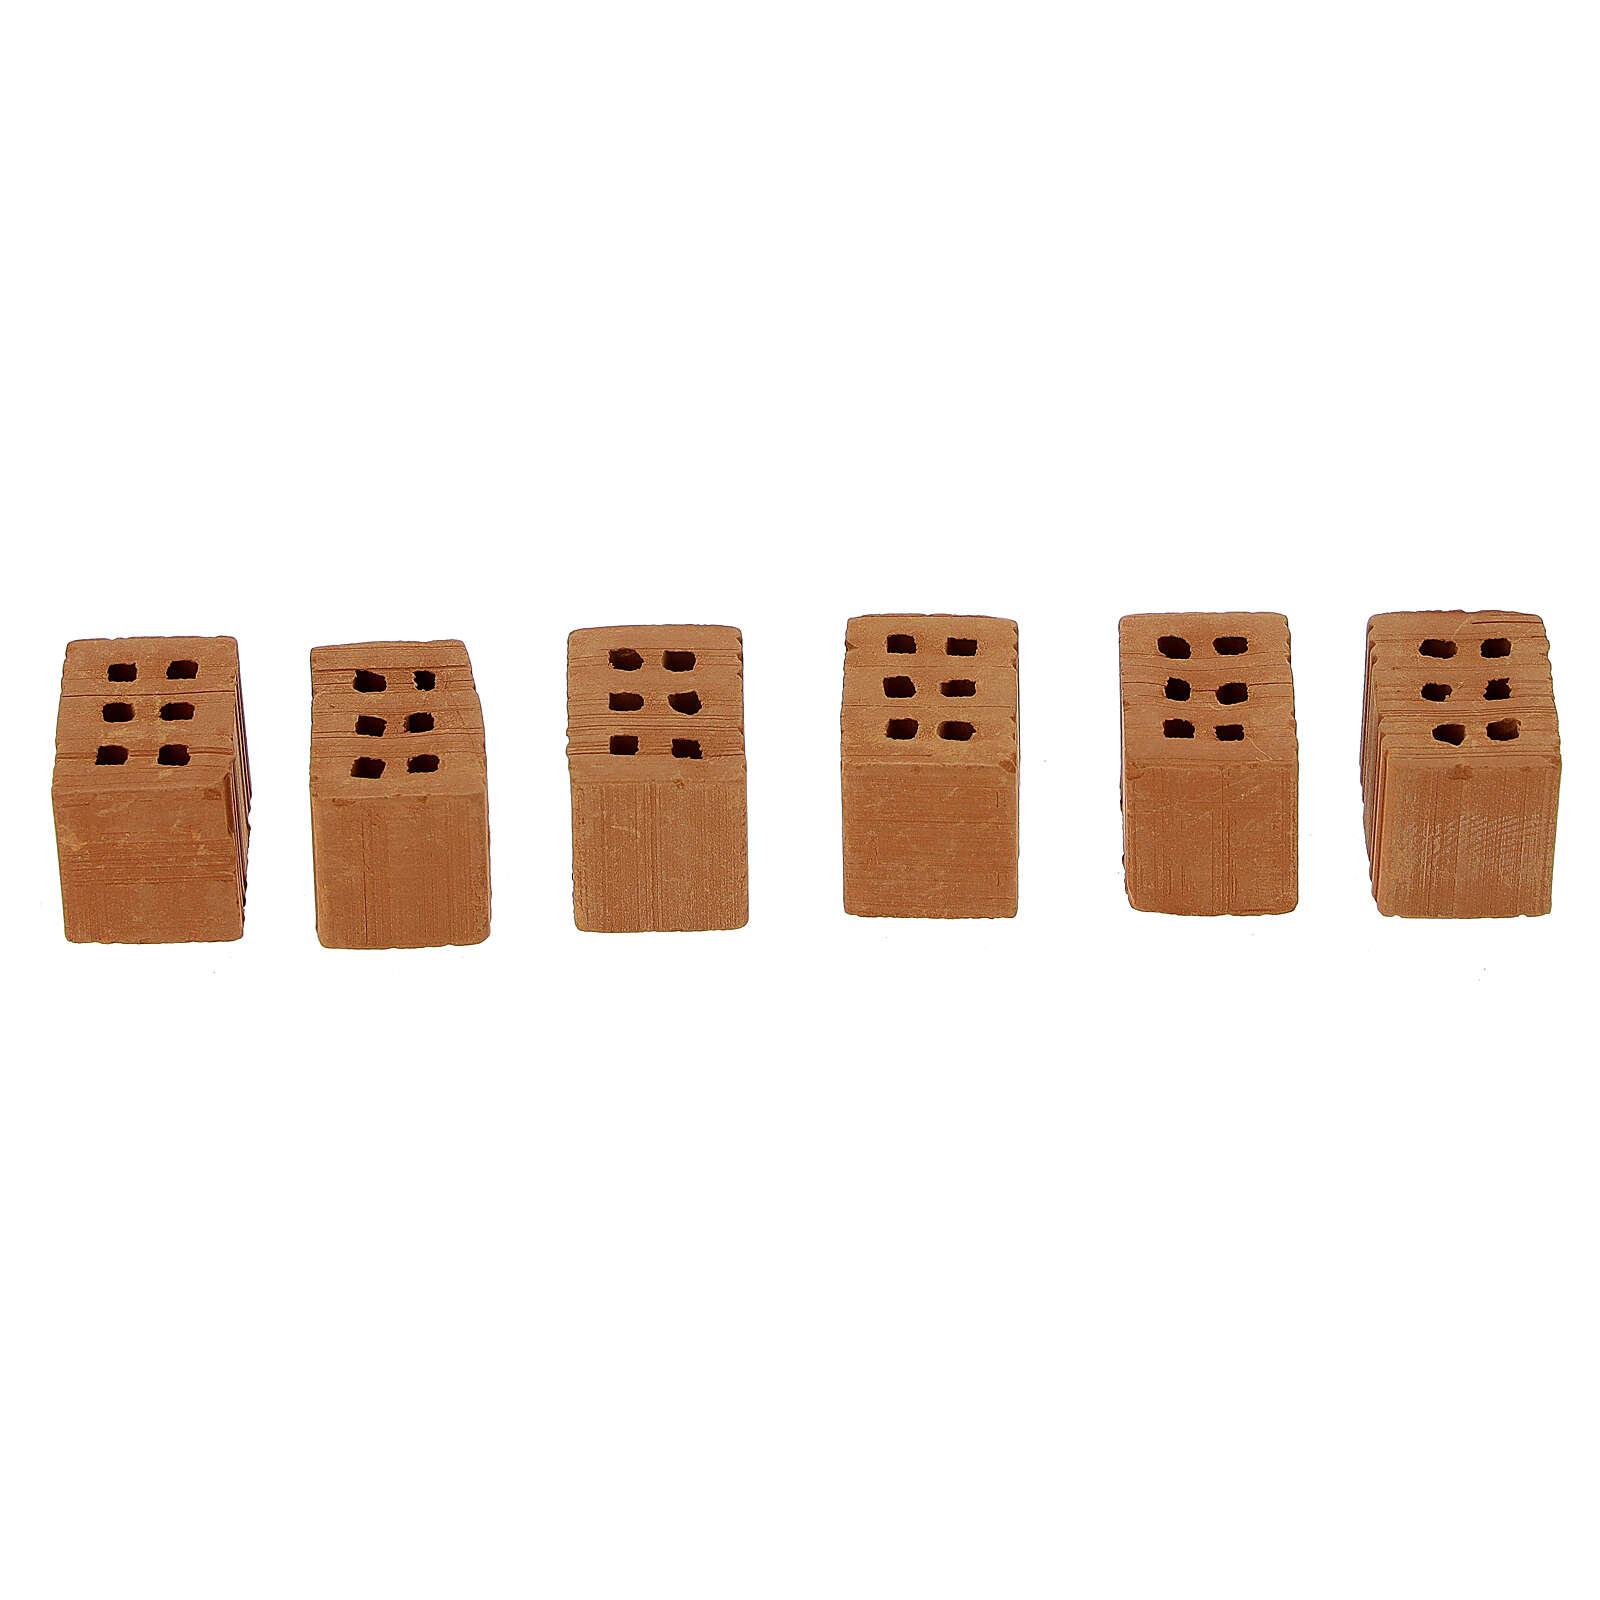 Ladrillos terracota 1x1,5x1 cm 100 piezas belén 4